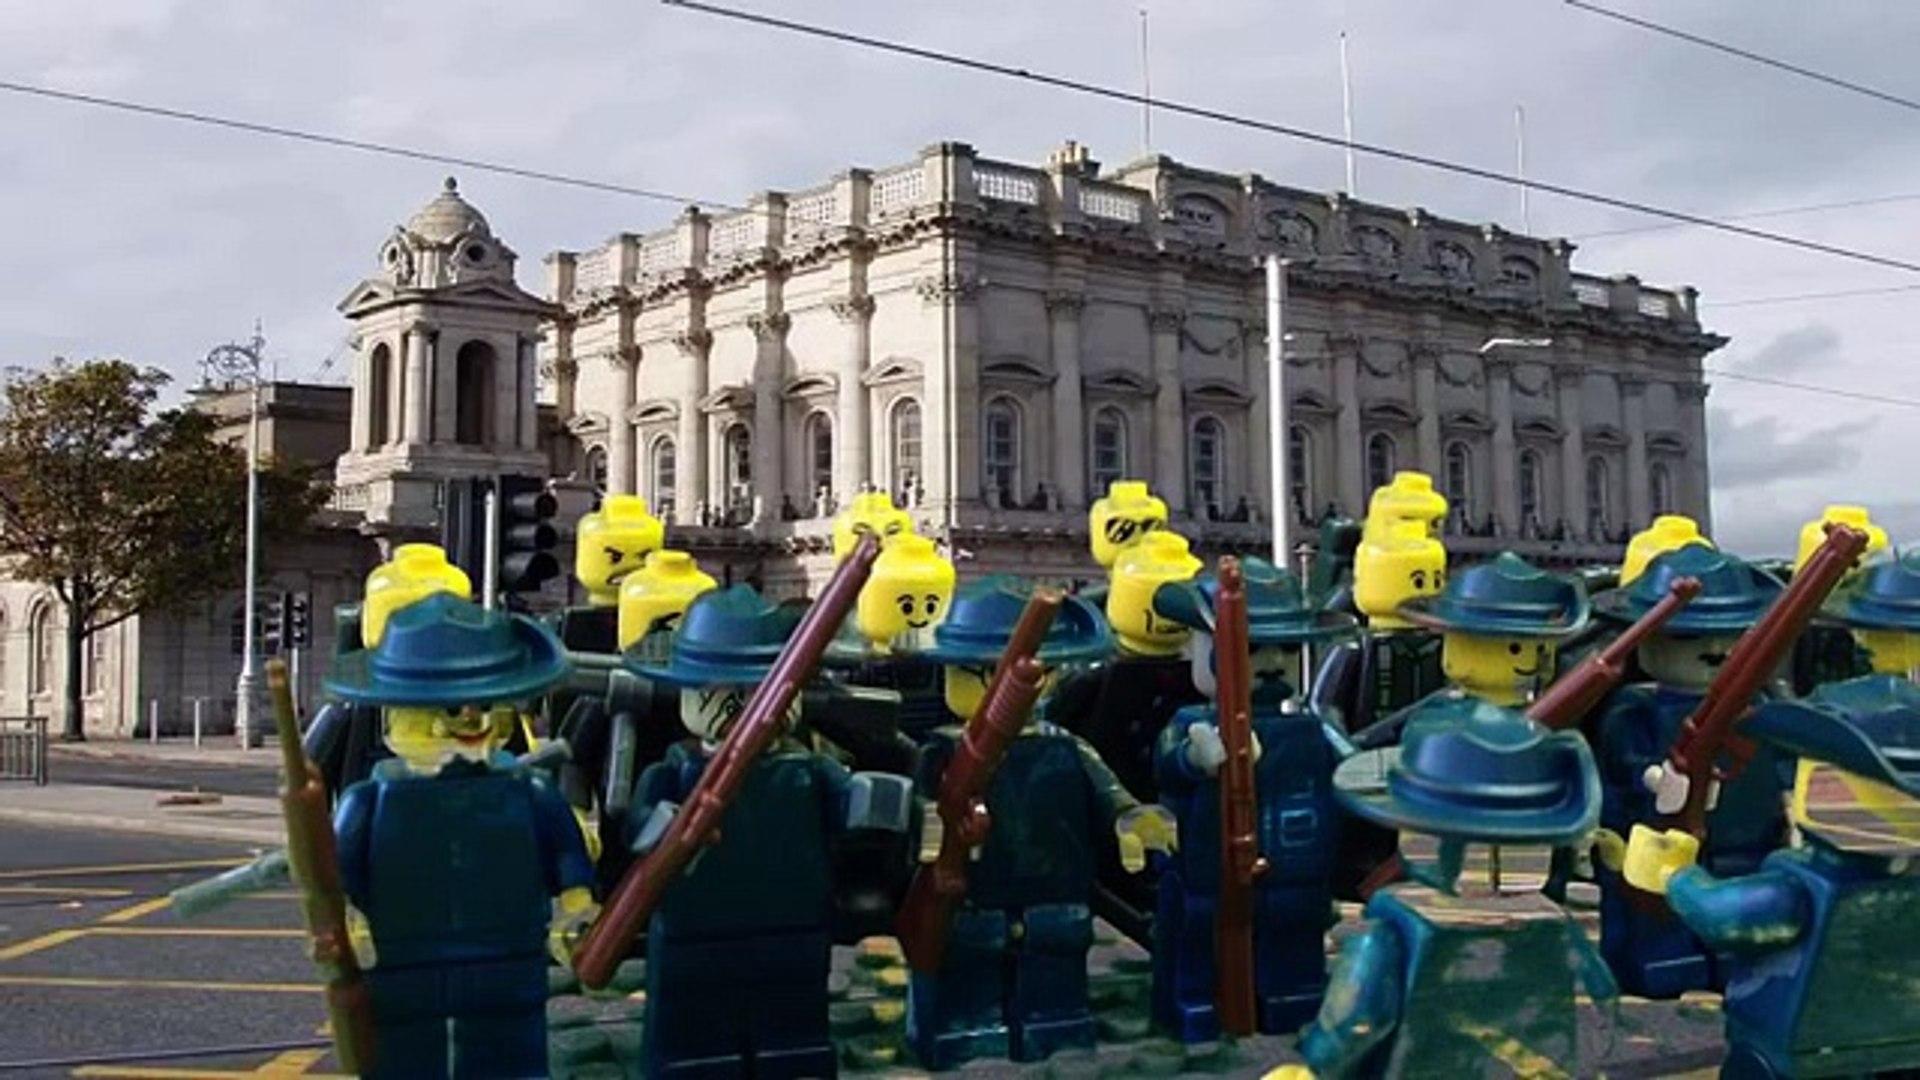 Lego 1916 The Movie